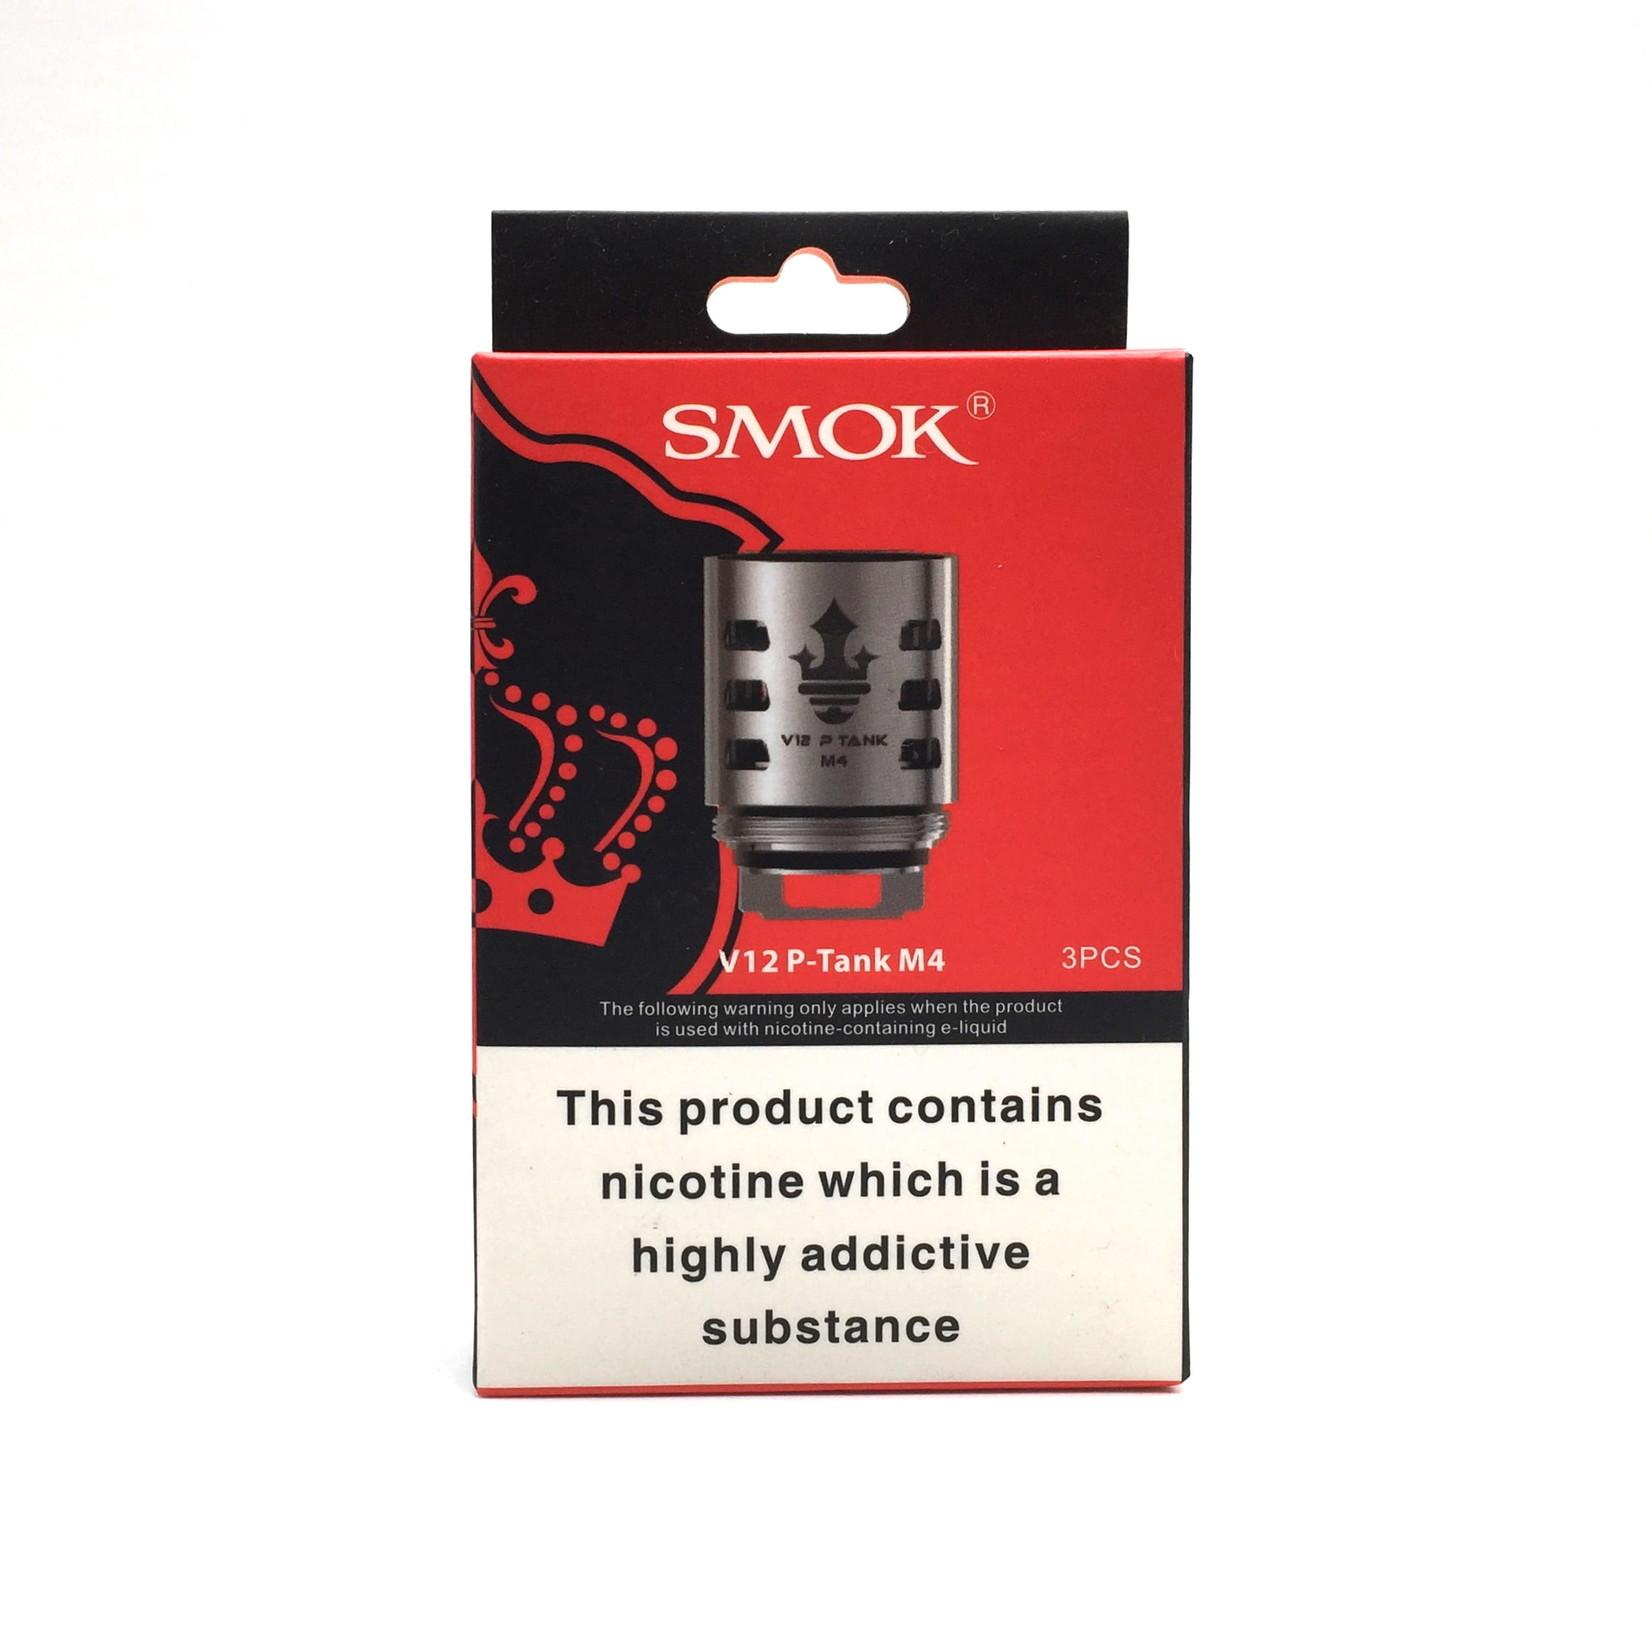 Smok V12 P-Tank Replacement Coils V12 - M4 ( 0.17 OHMS ) Pack ( 3pcs )